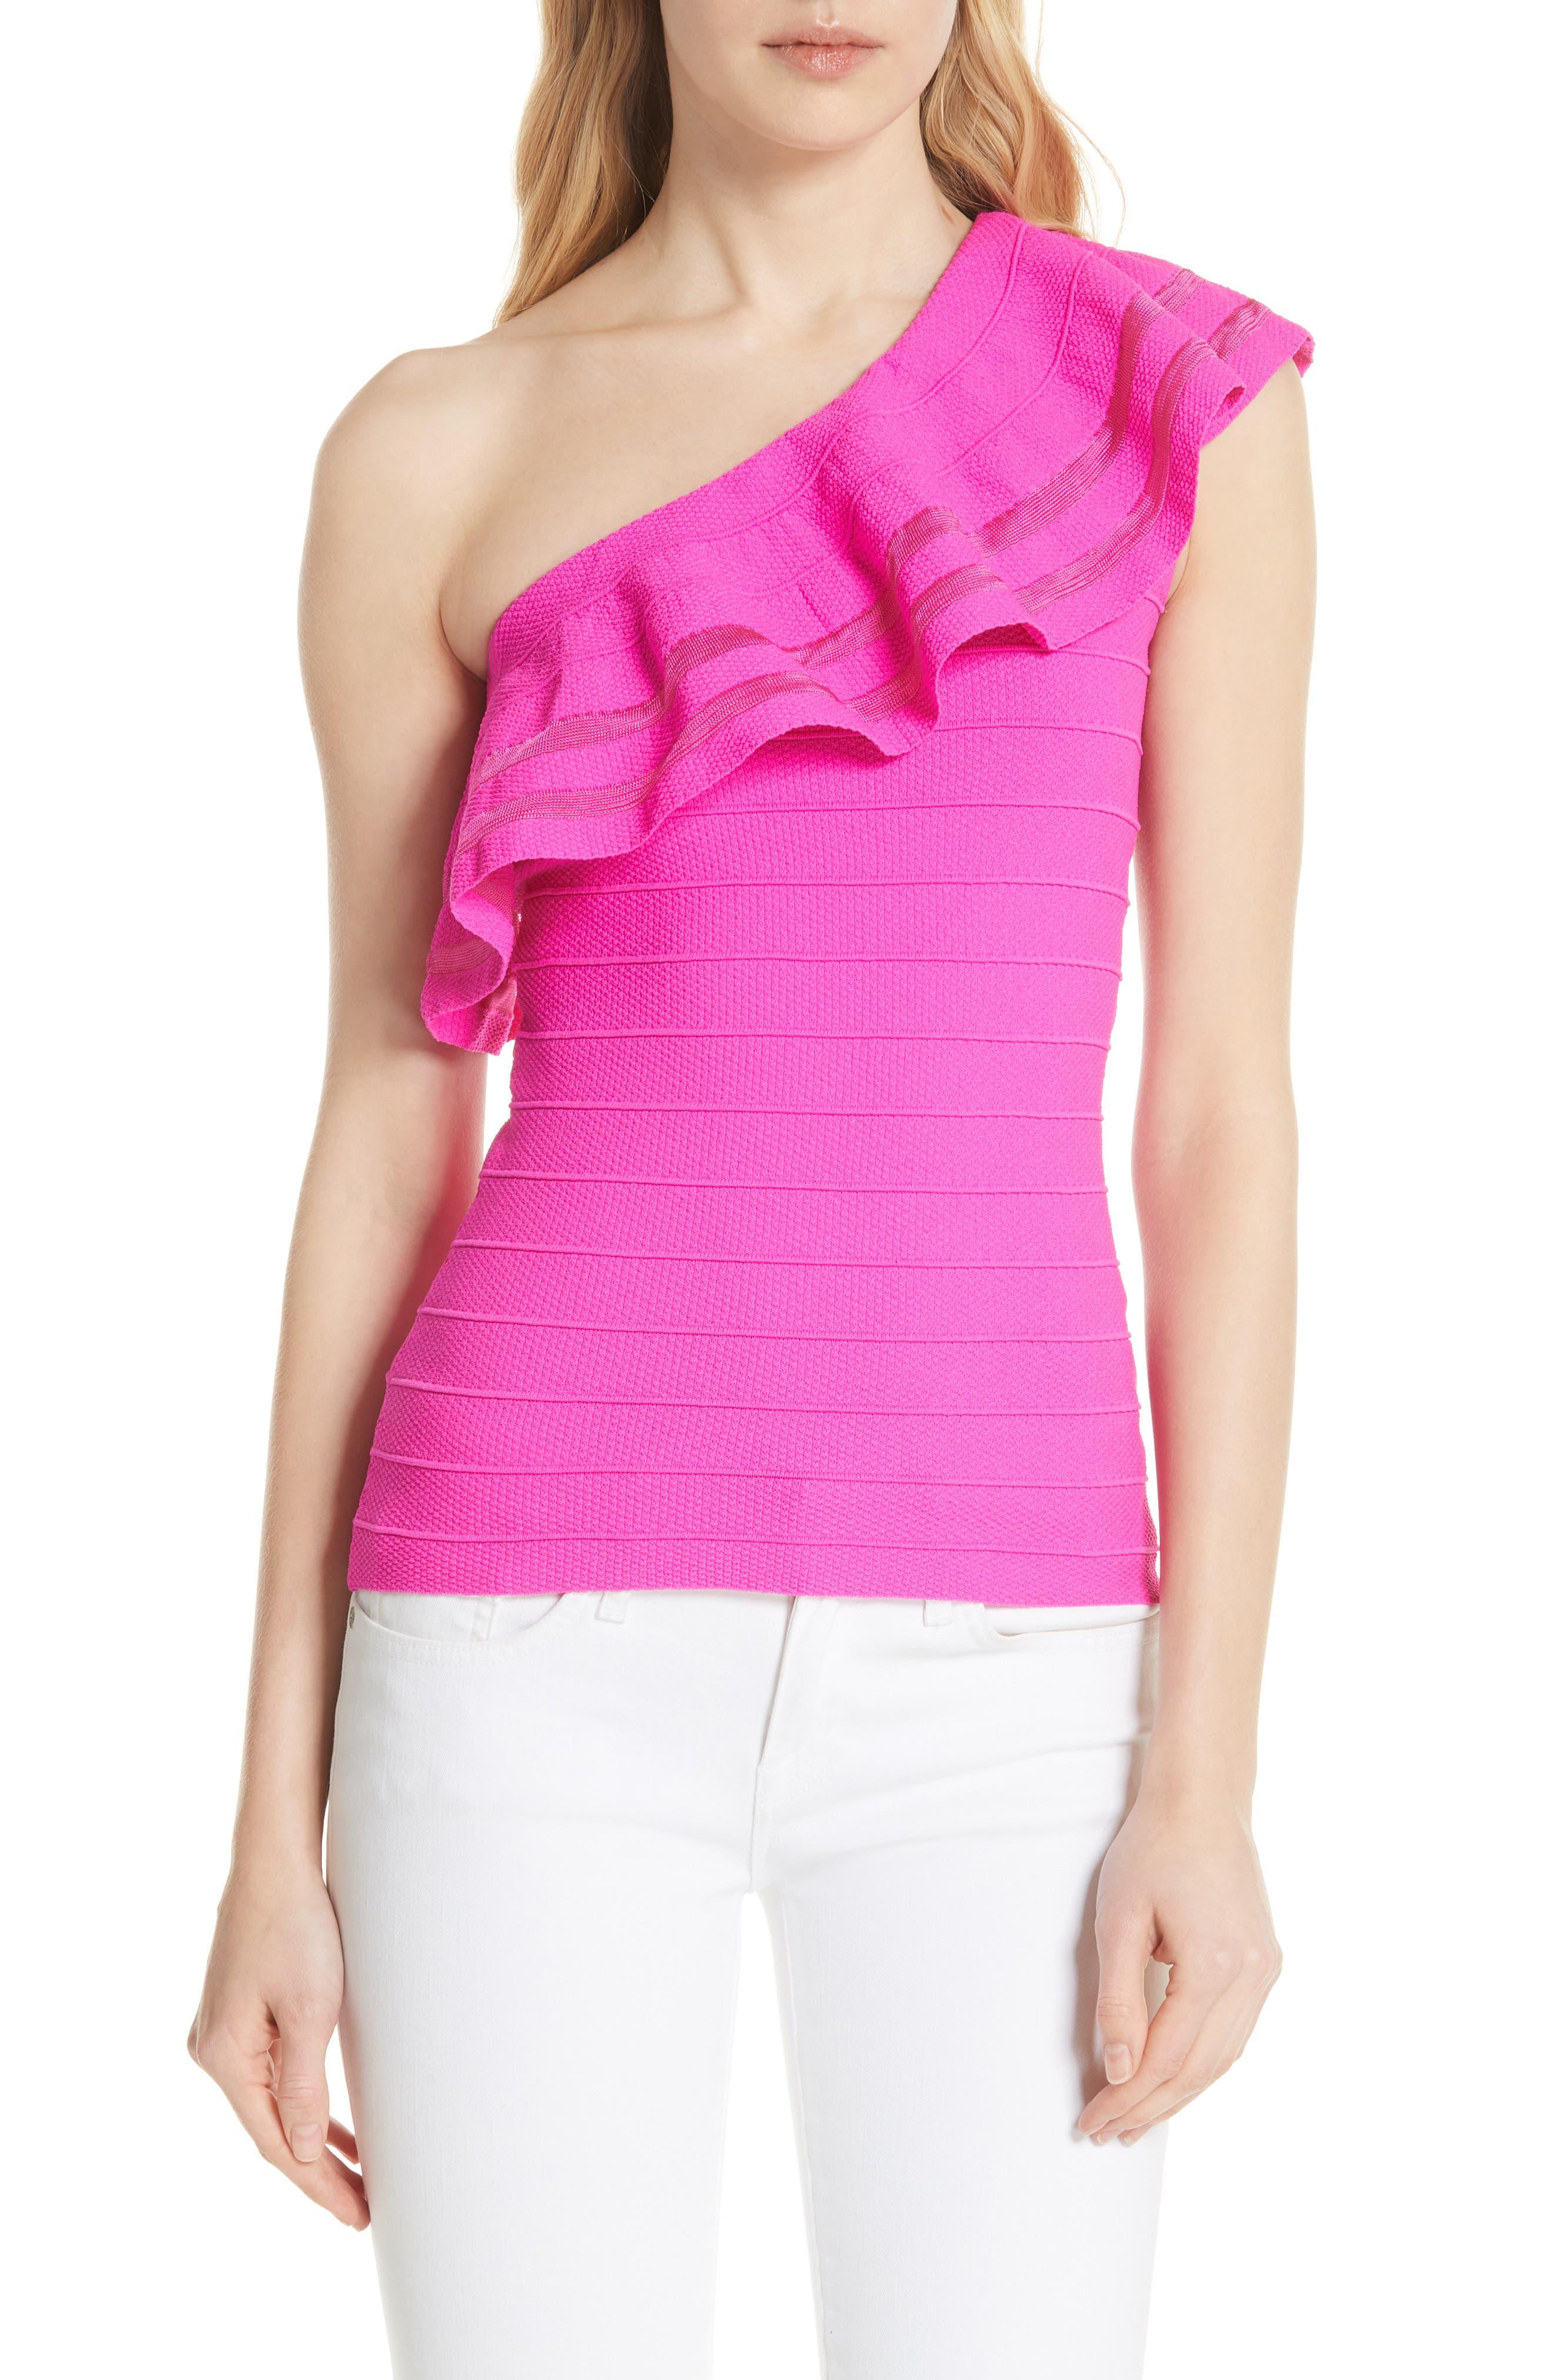 Reigann One-Shoulder Ruffle Knit Top,                         Main,                         color, 671